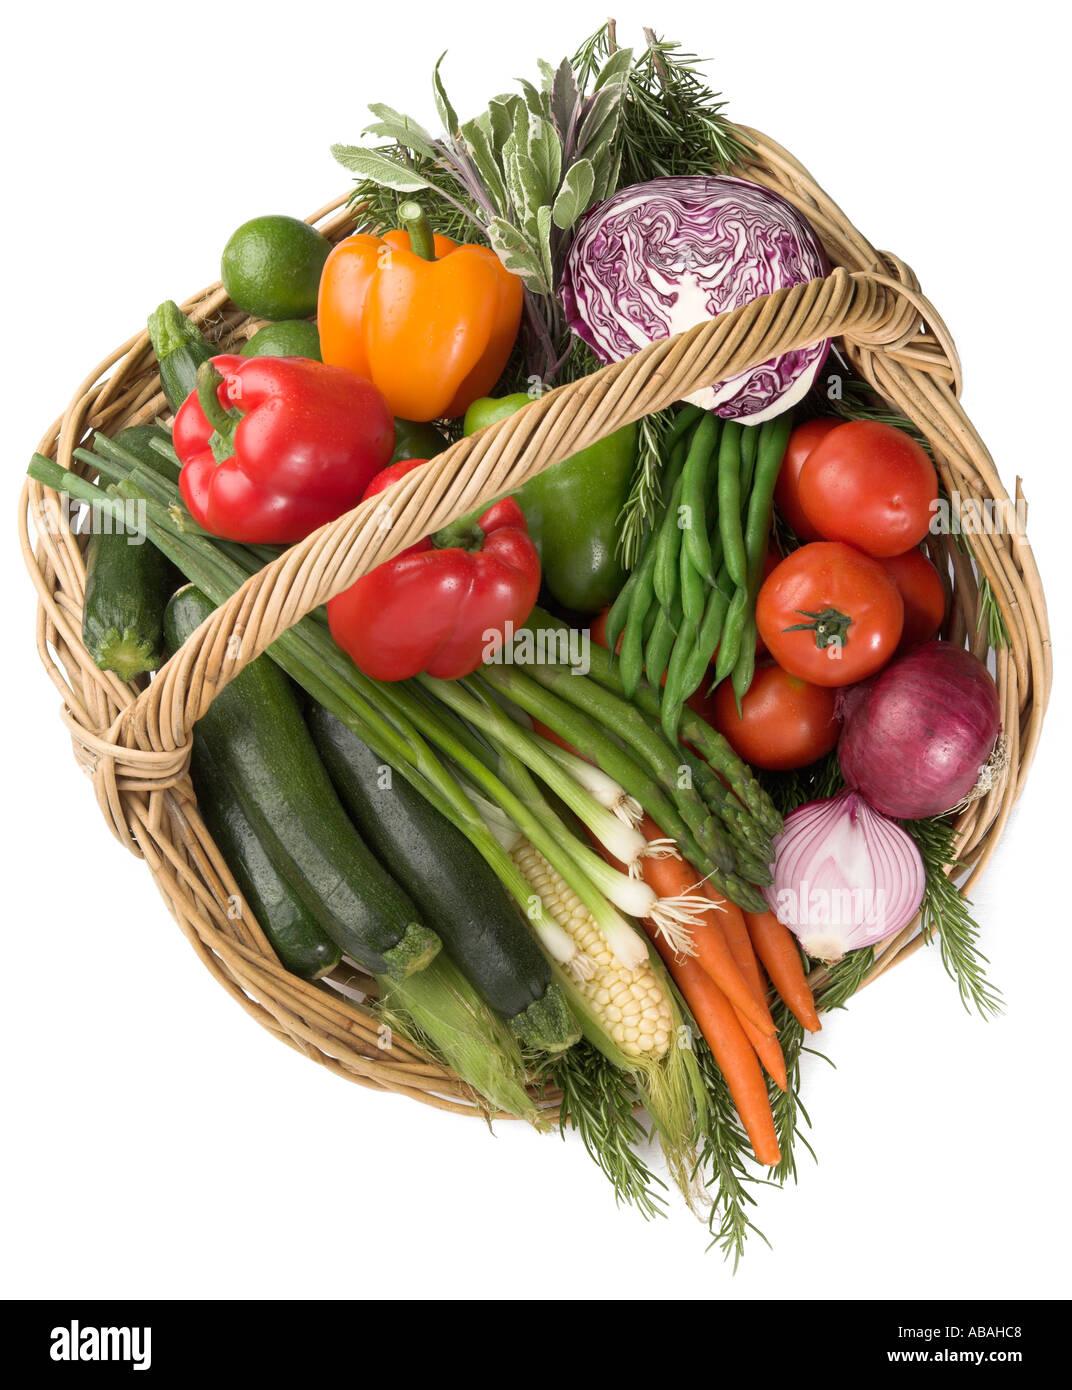 Cornucopia of Vegetables in a basket - Stock Image